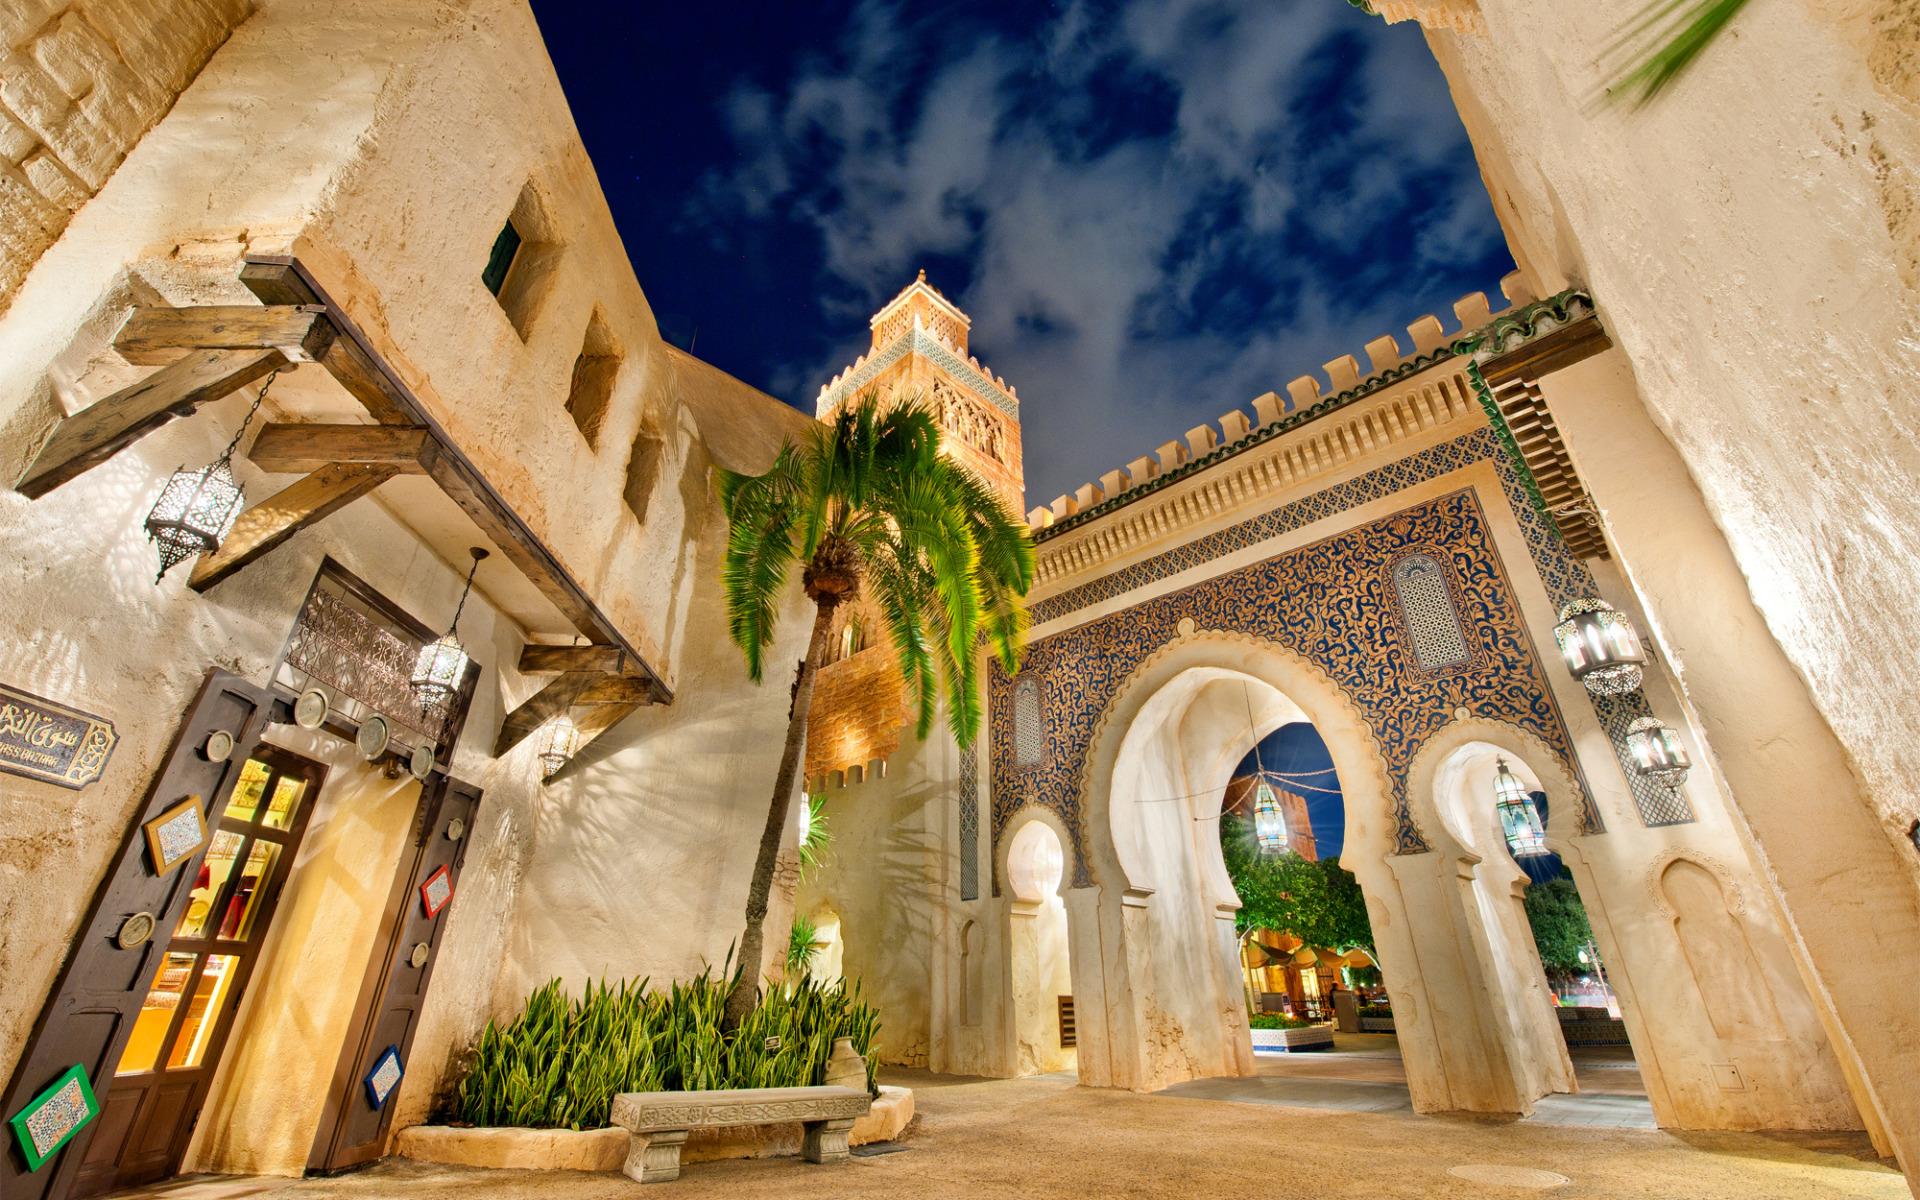 3d Graffiti Wallpapers Free Download Moroccan Wallpapers Hd Pixelstalk Net